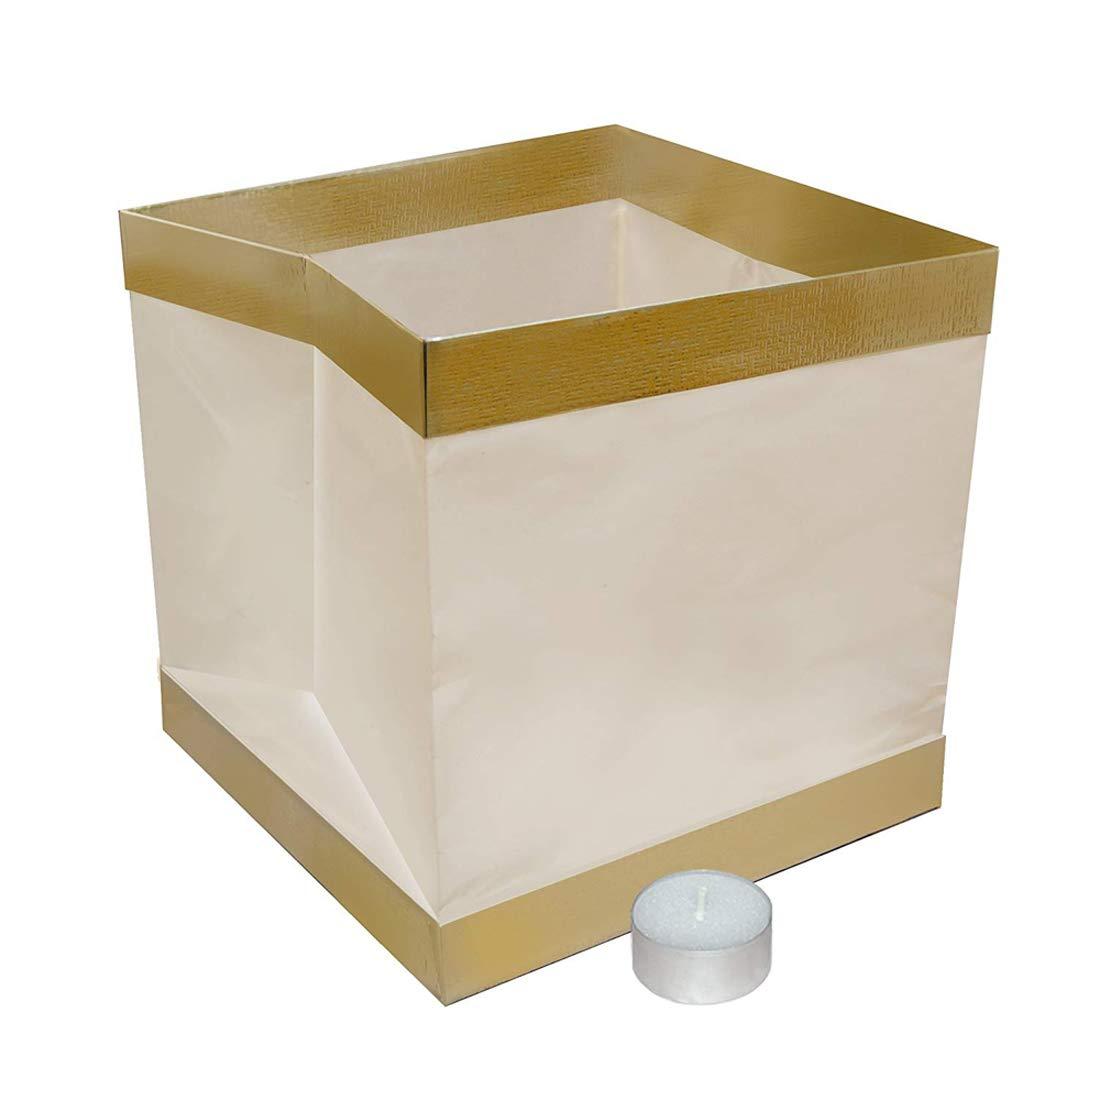 HomeABC Water Floating Candle Wish Lanterns,Set of 20